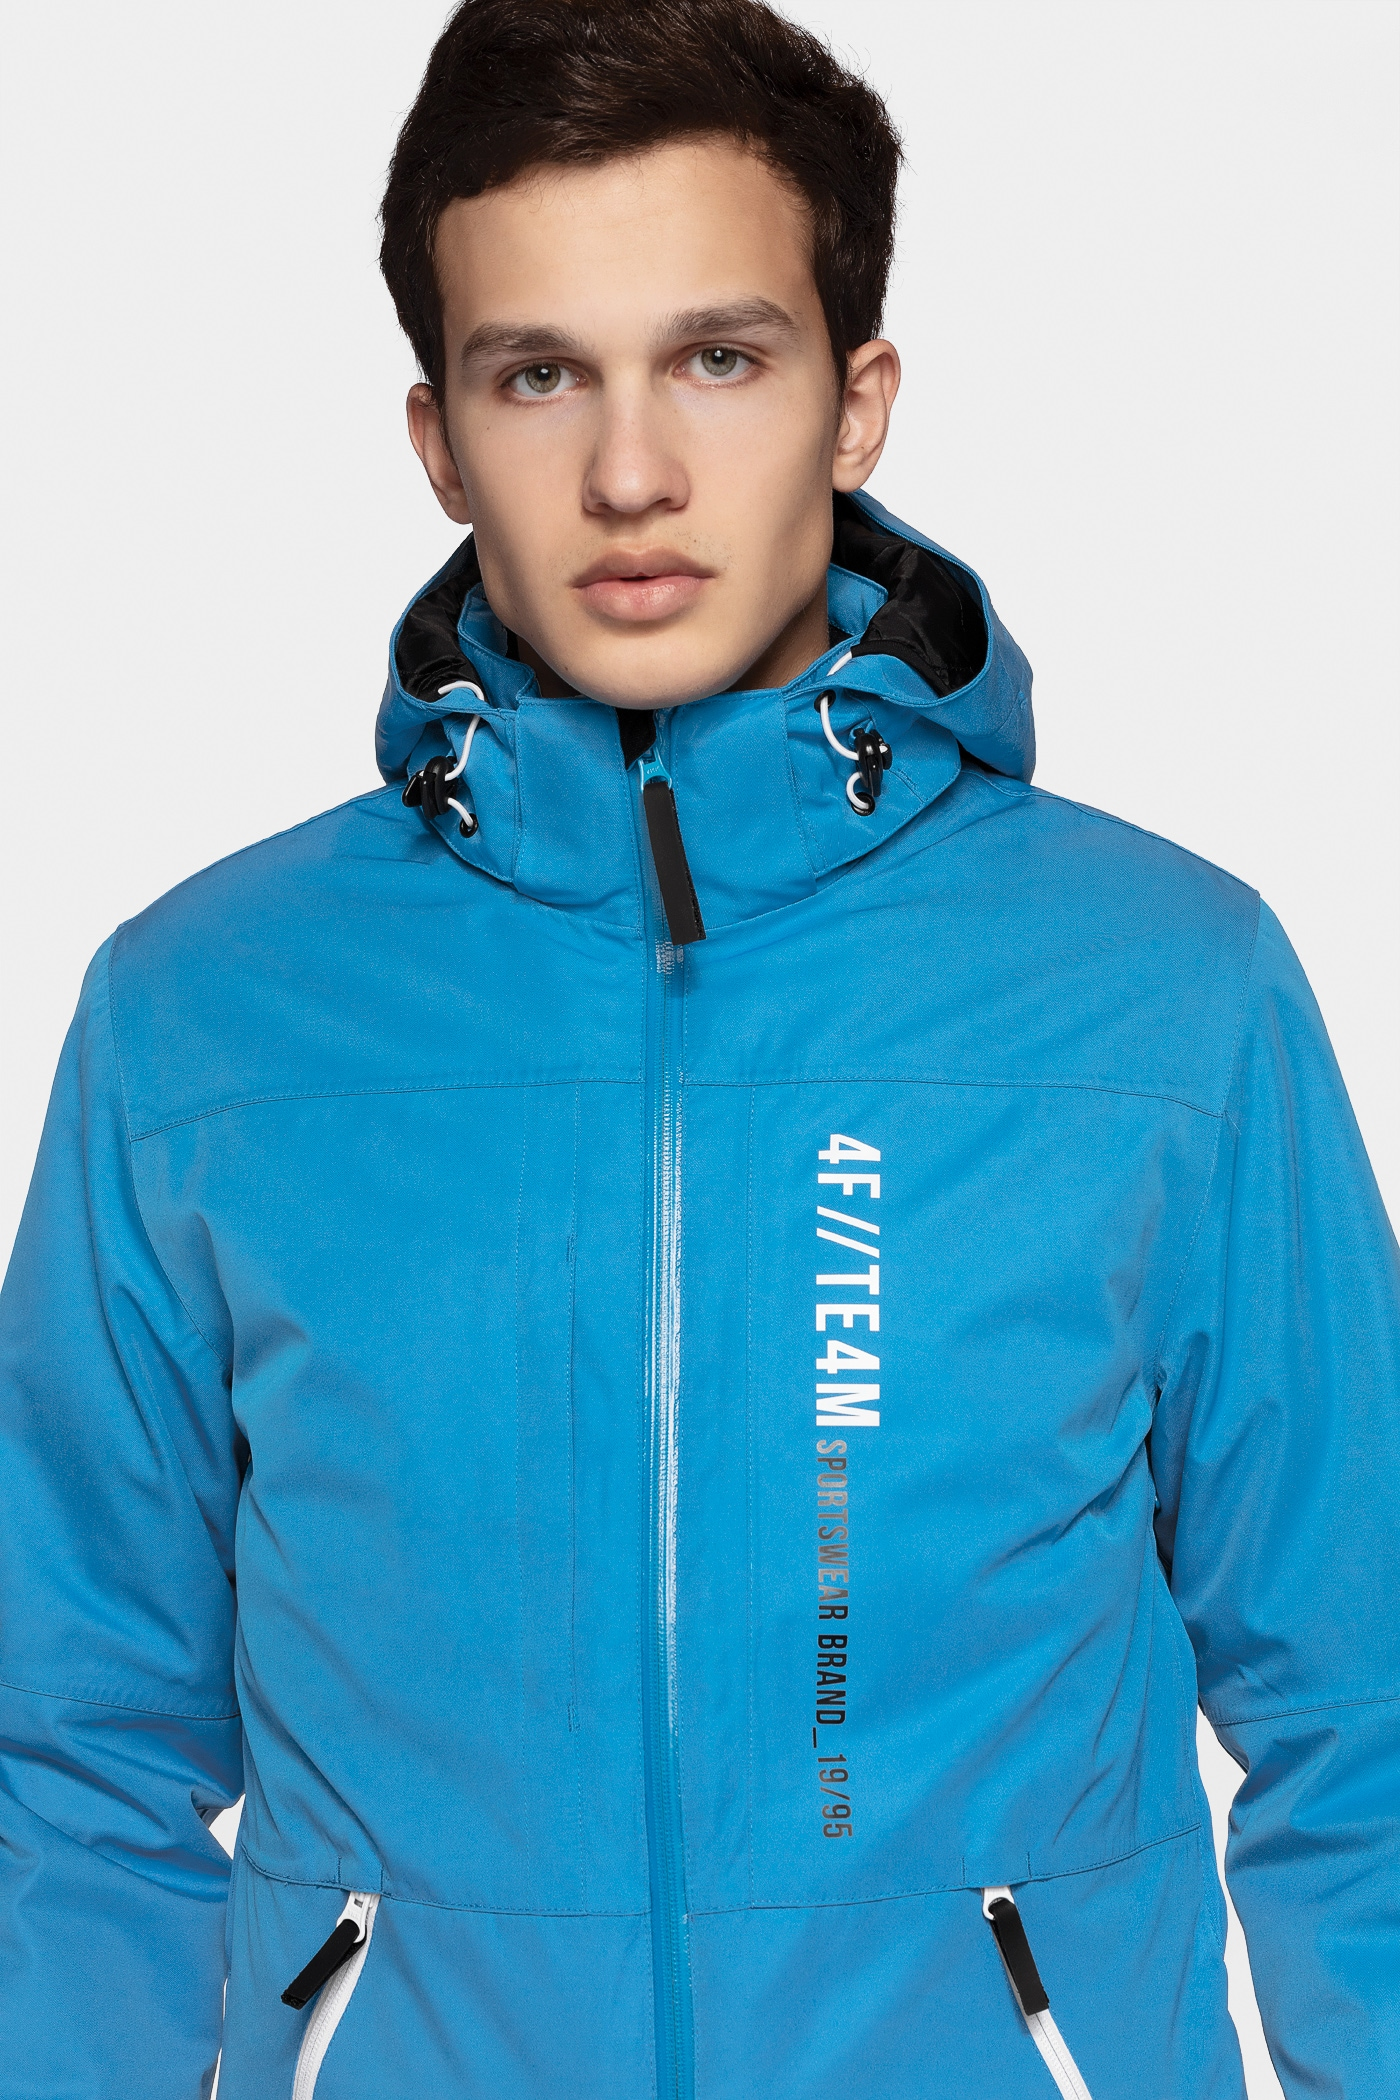 383175a5d4 Kurtka narciarska męska KUMN552R - niebieski Kurtki narciarskie i ...